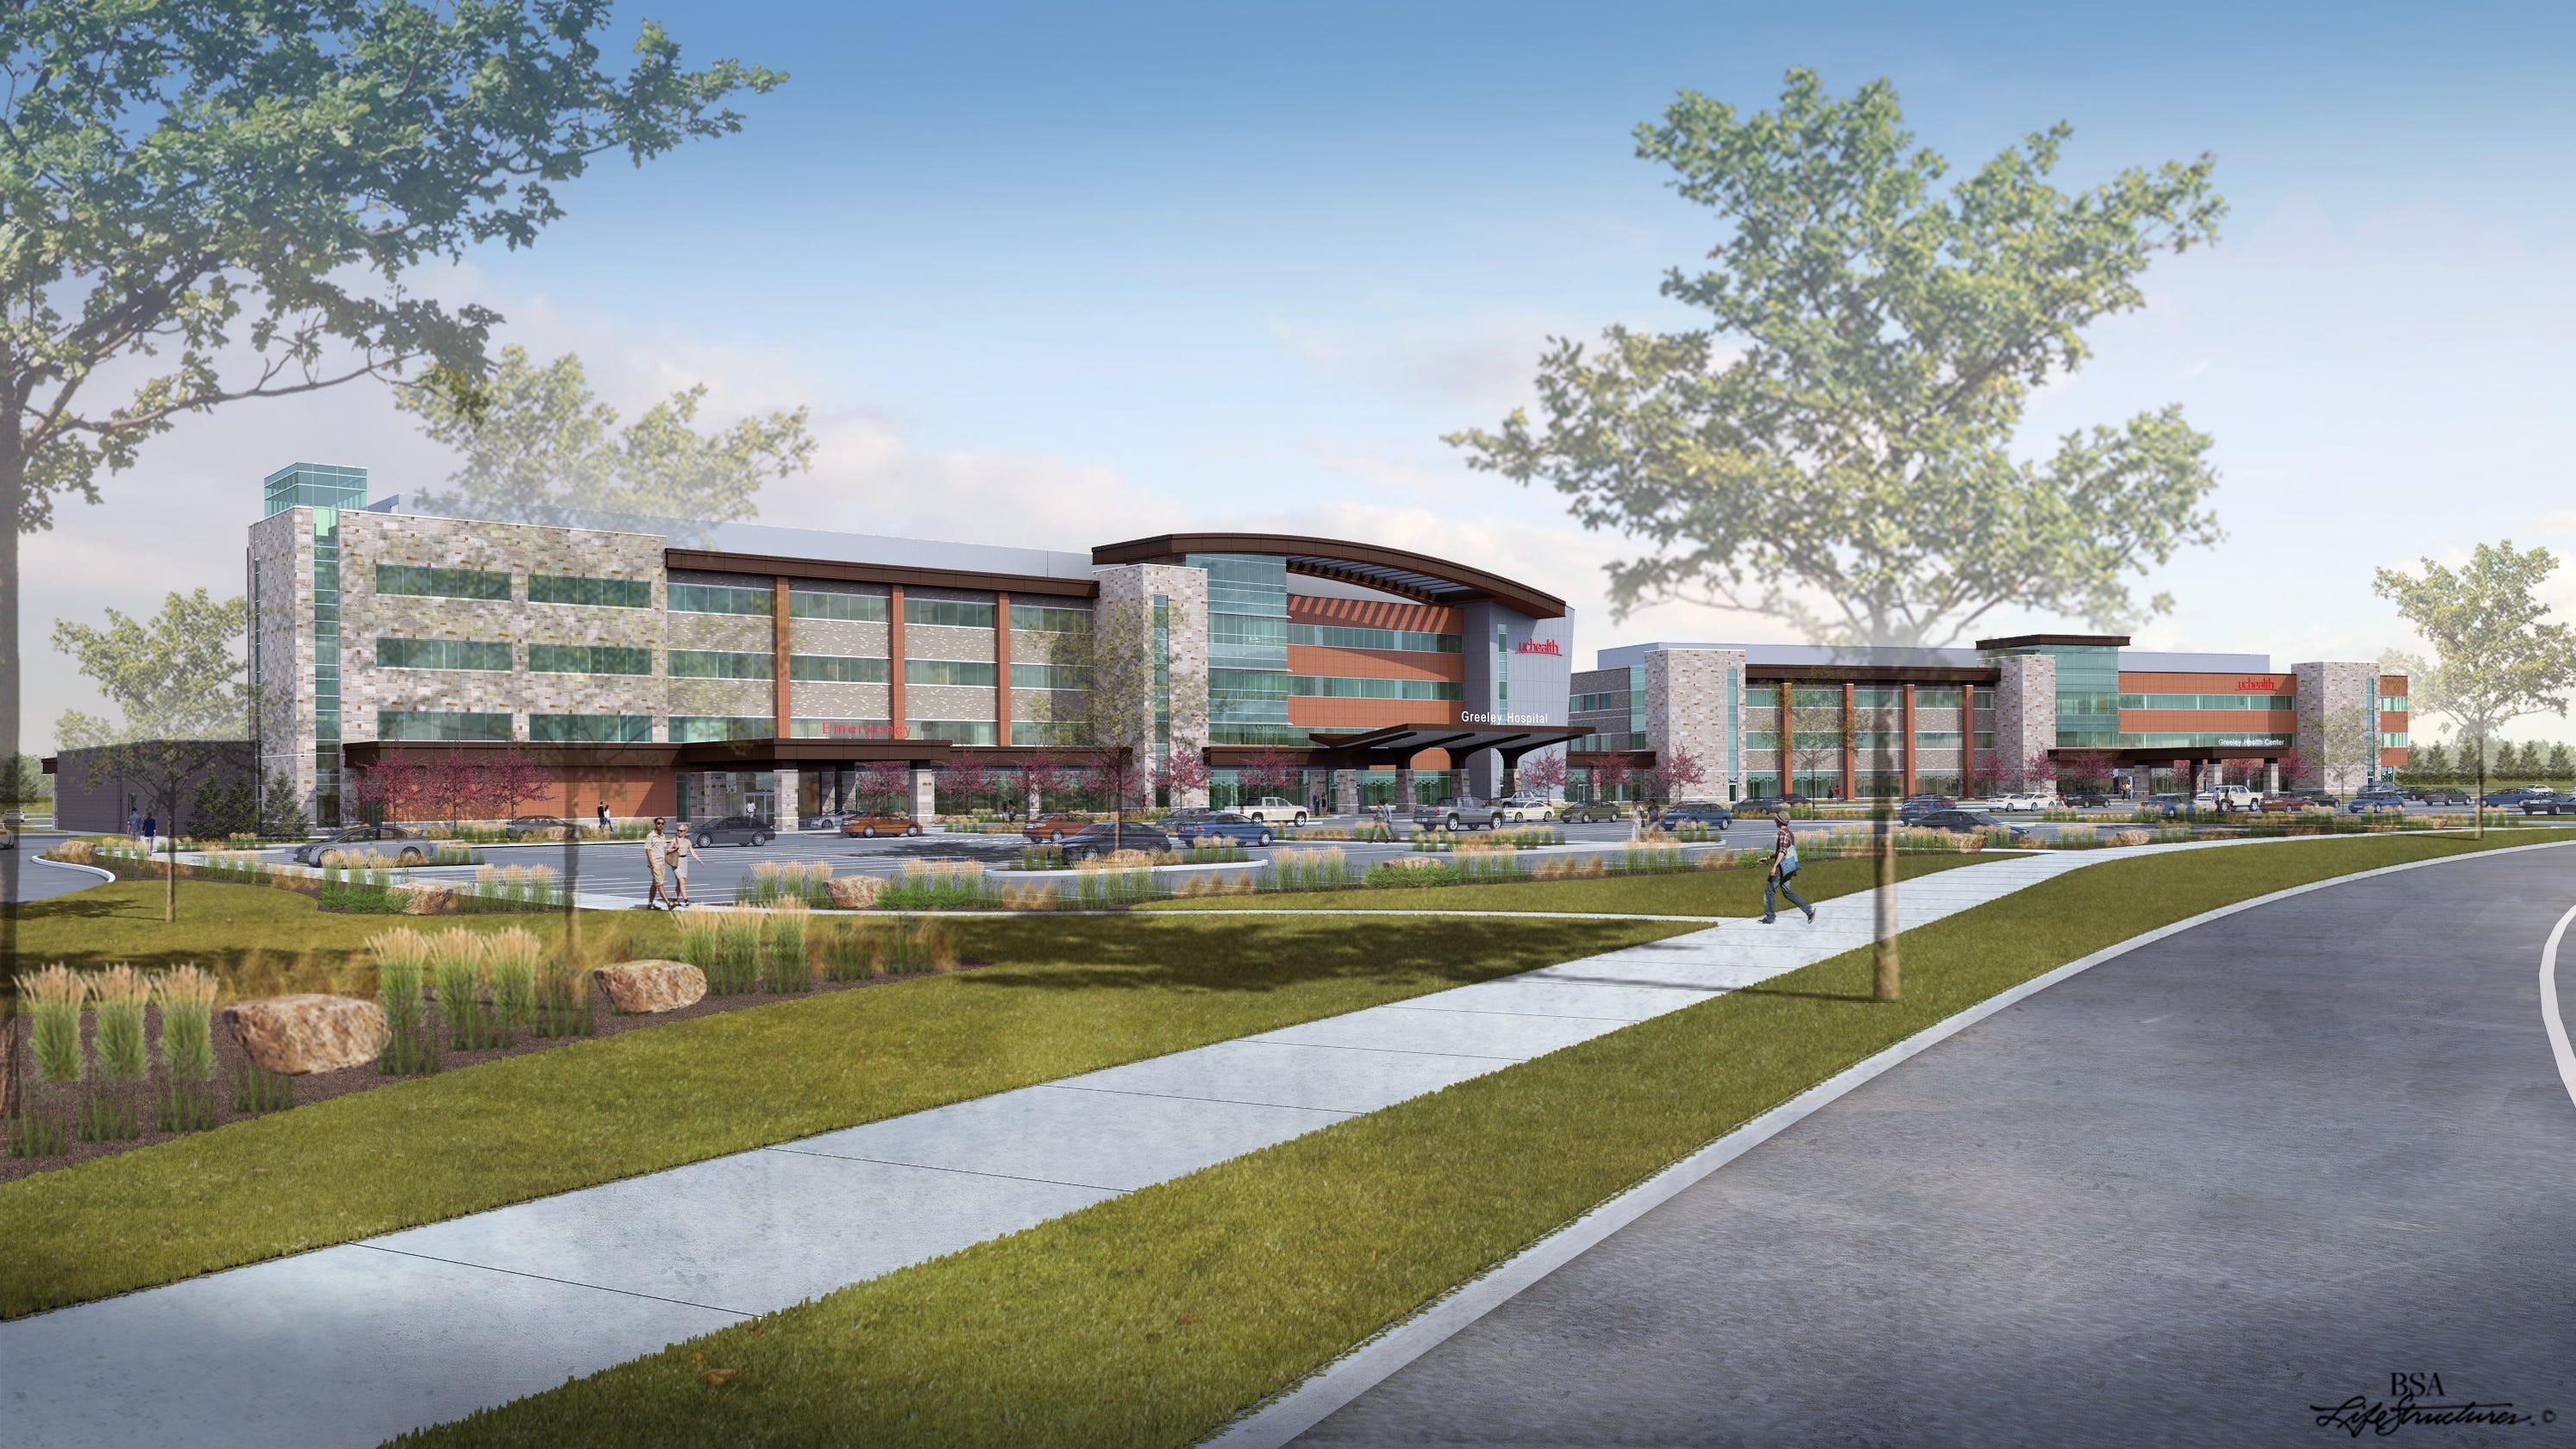 Greeley's UCHealth hospital filling 400 new jobs